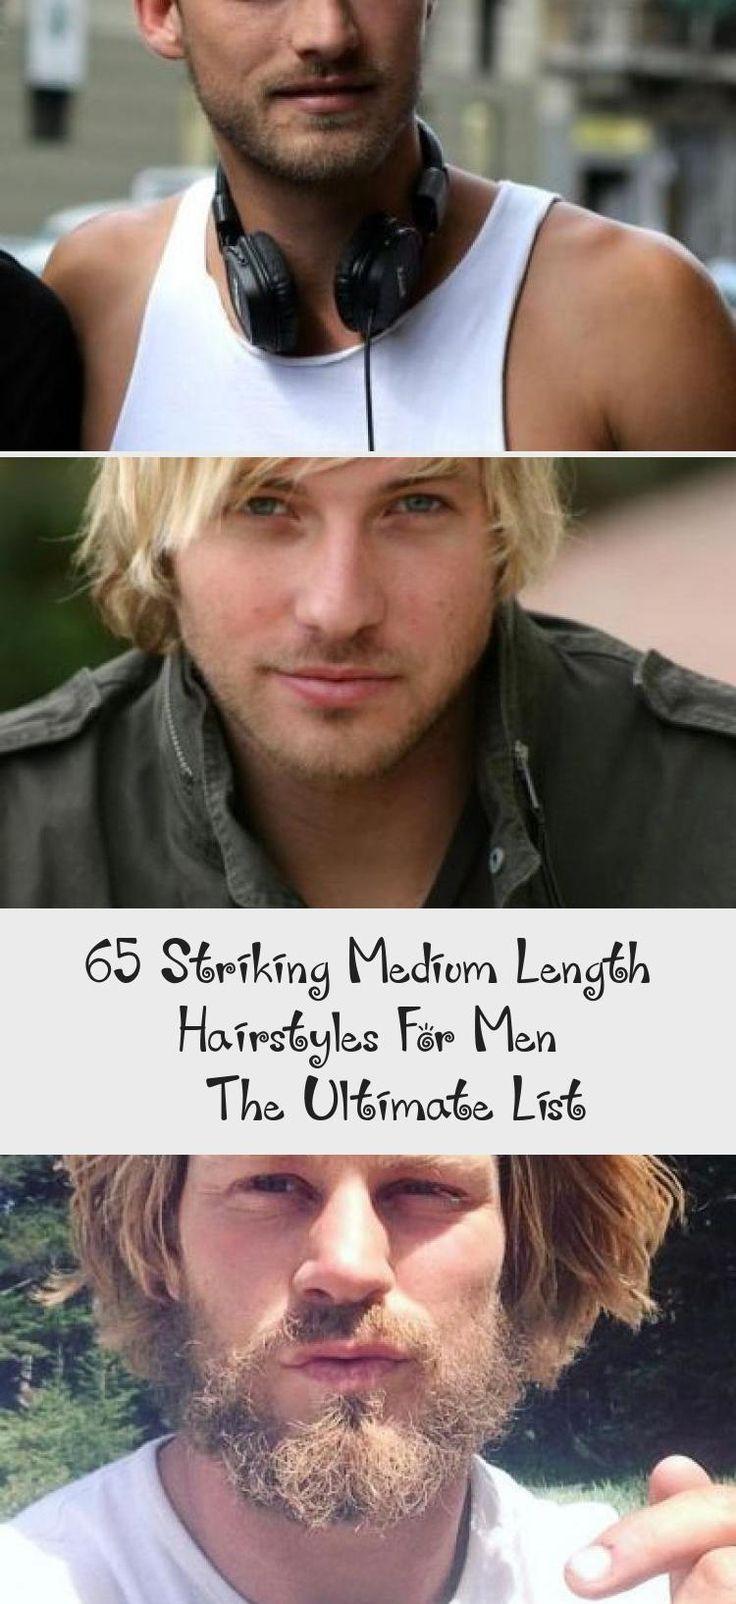 65 Striking Medium Length Hairstyles For Men – The Ultimate List